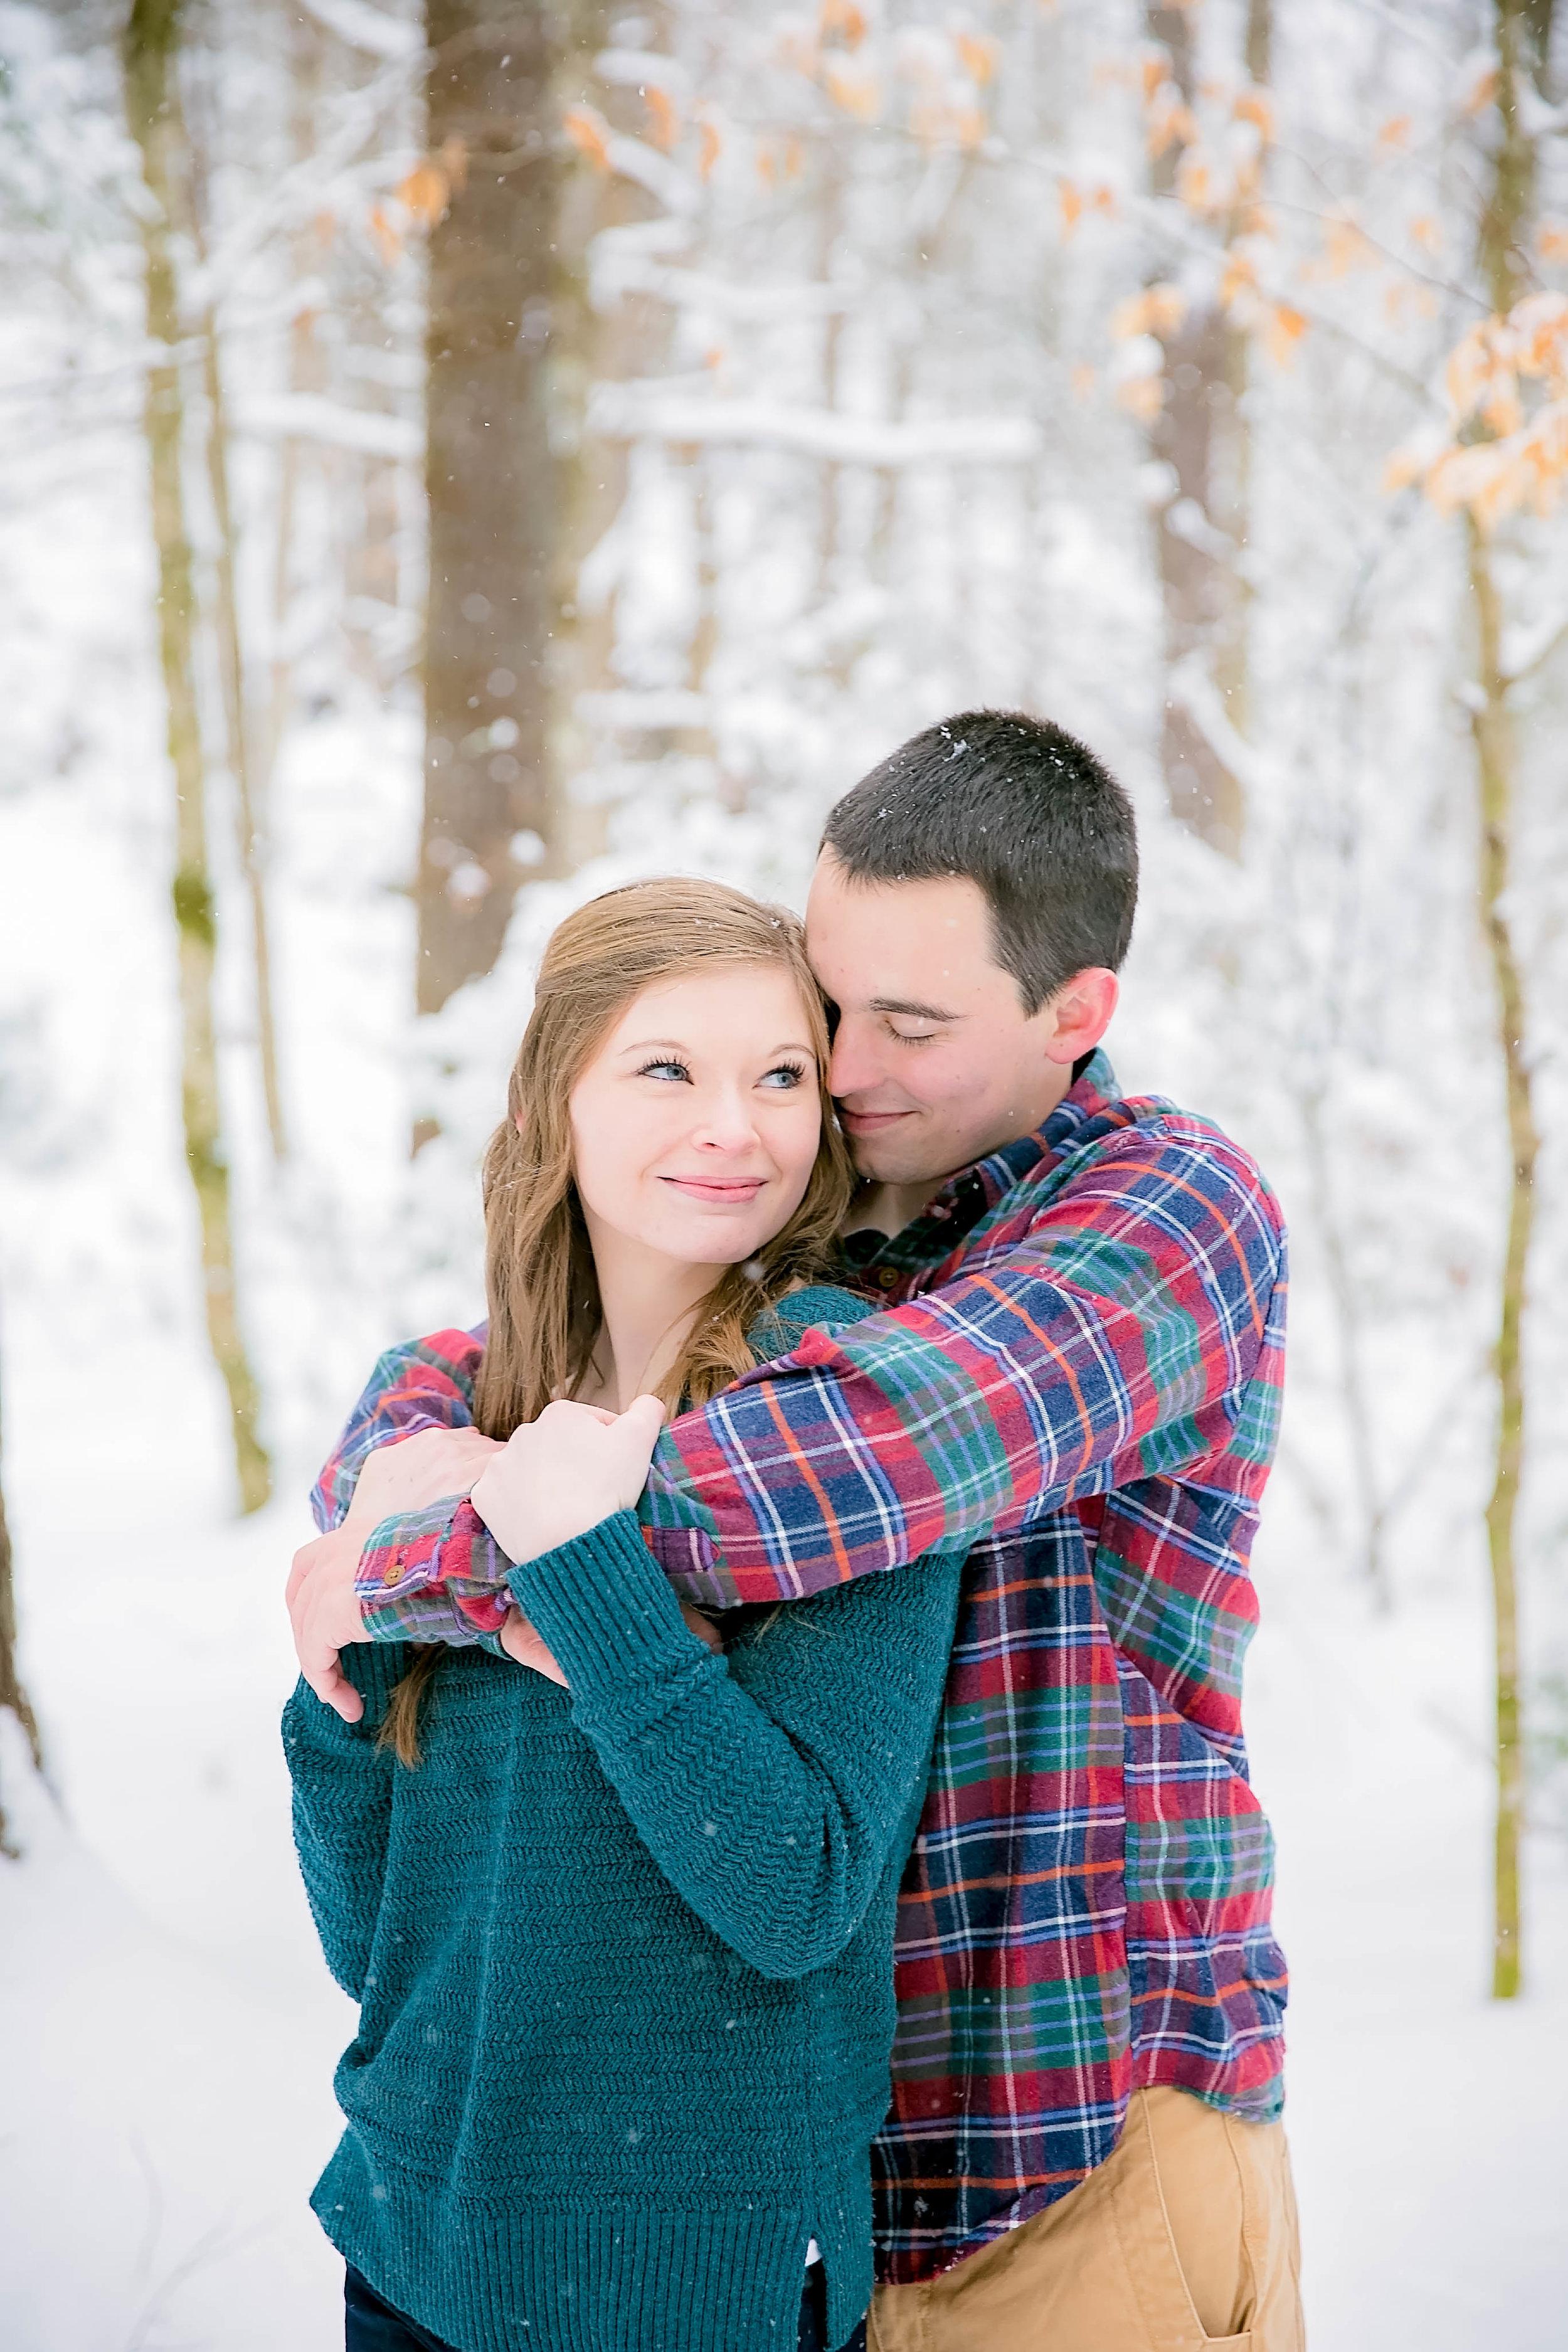 Couple in snow, Laurel Falls, TN